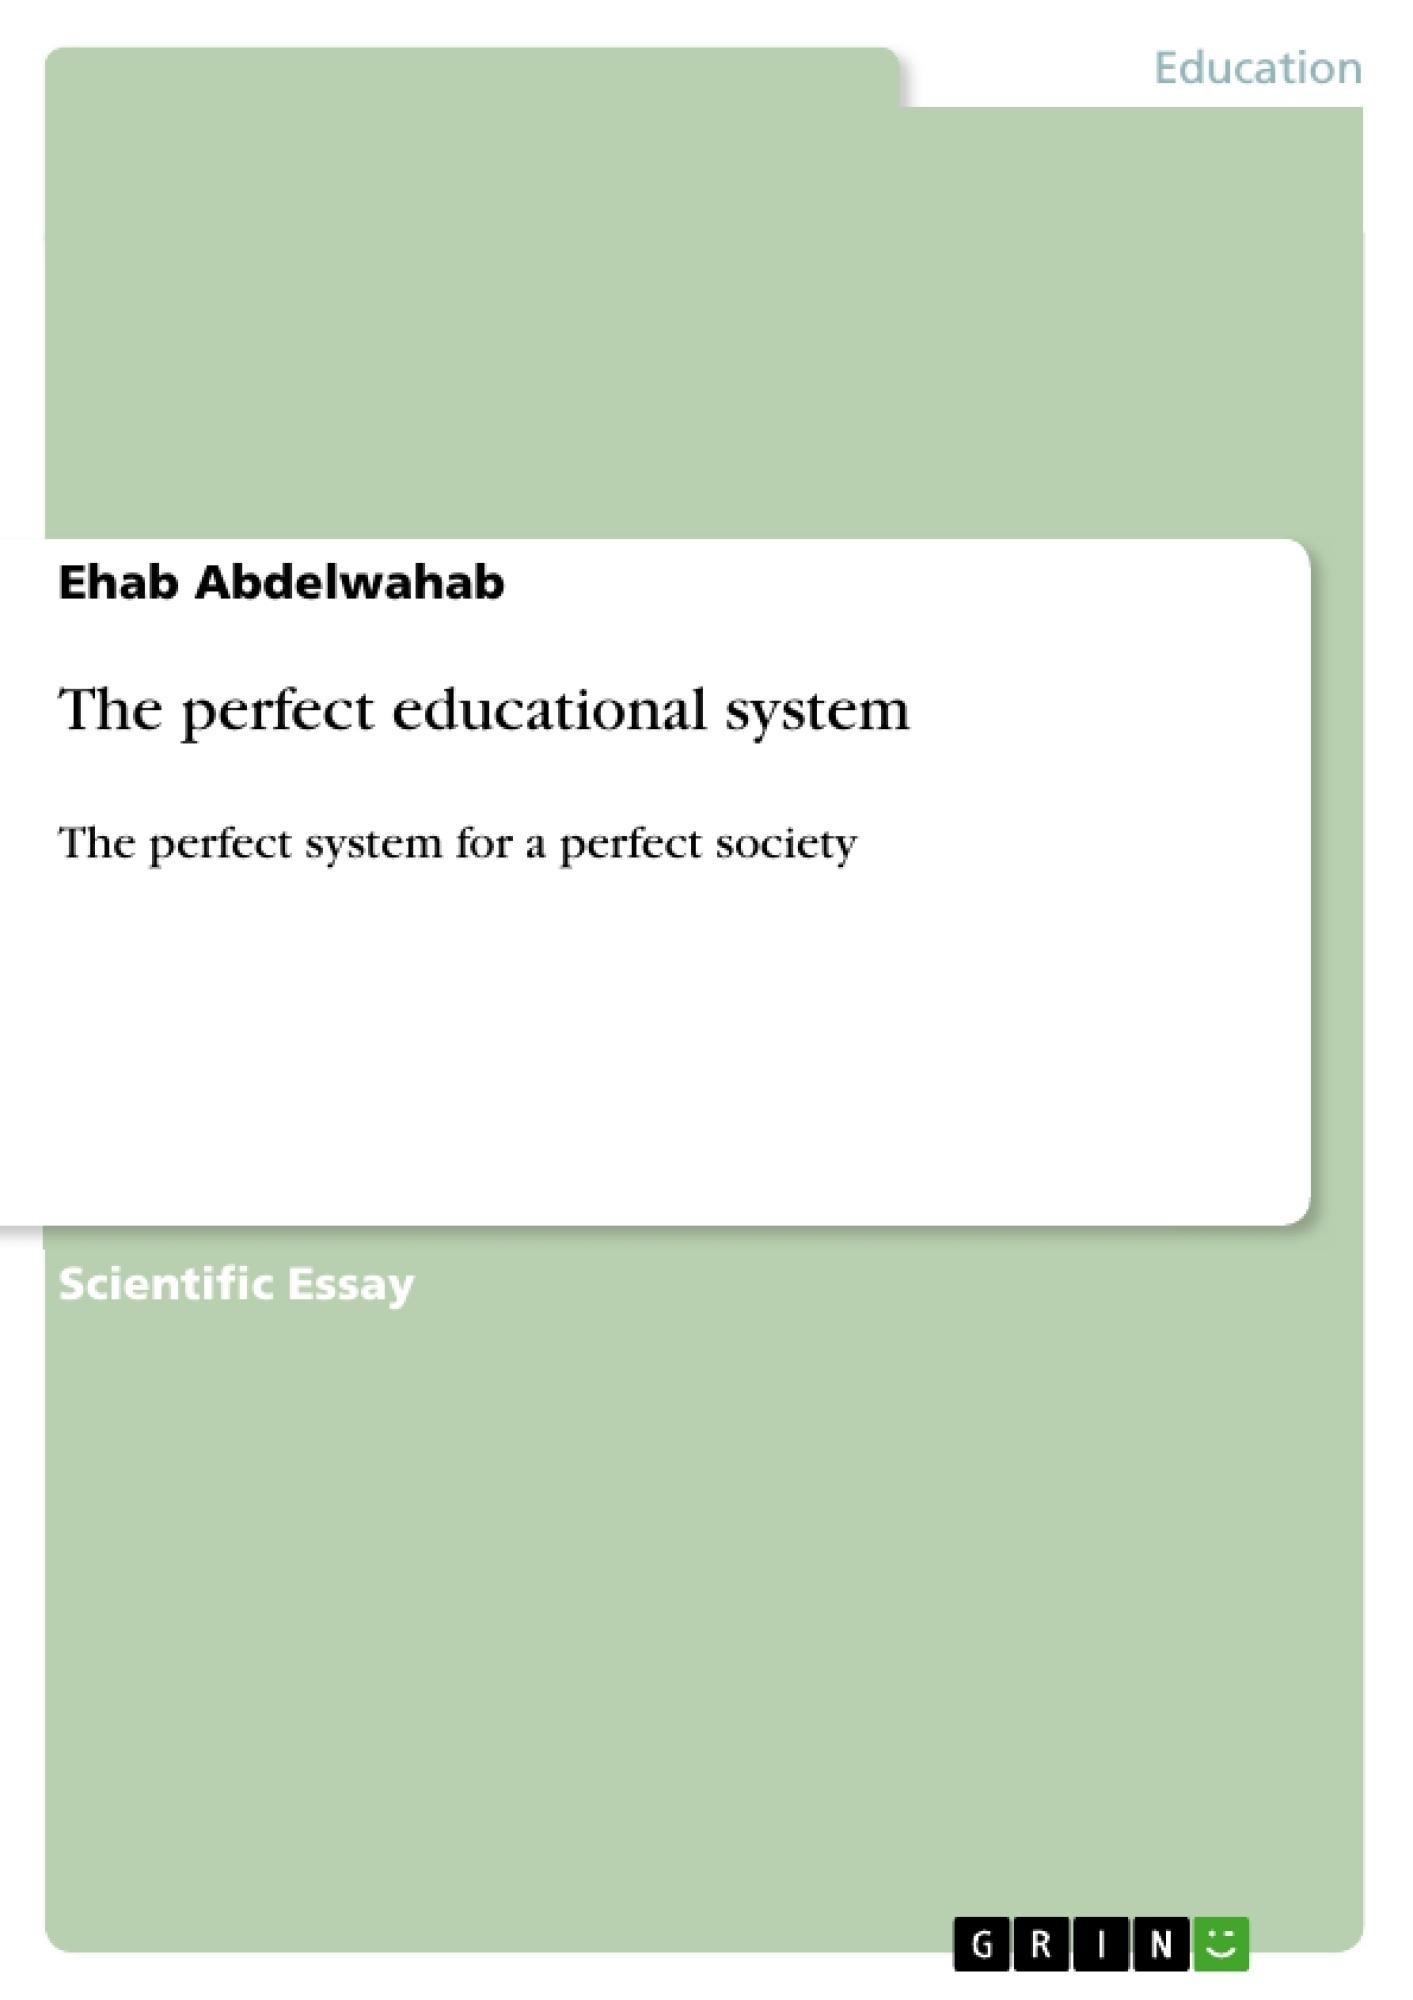 Good education essay